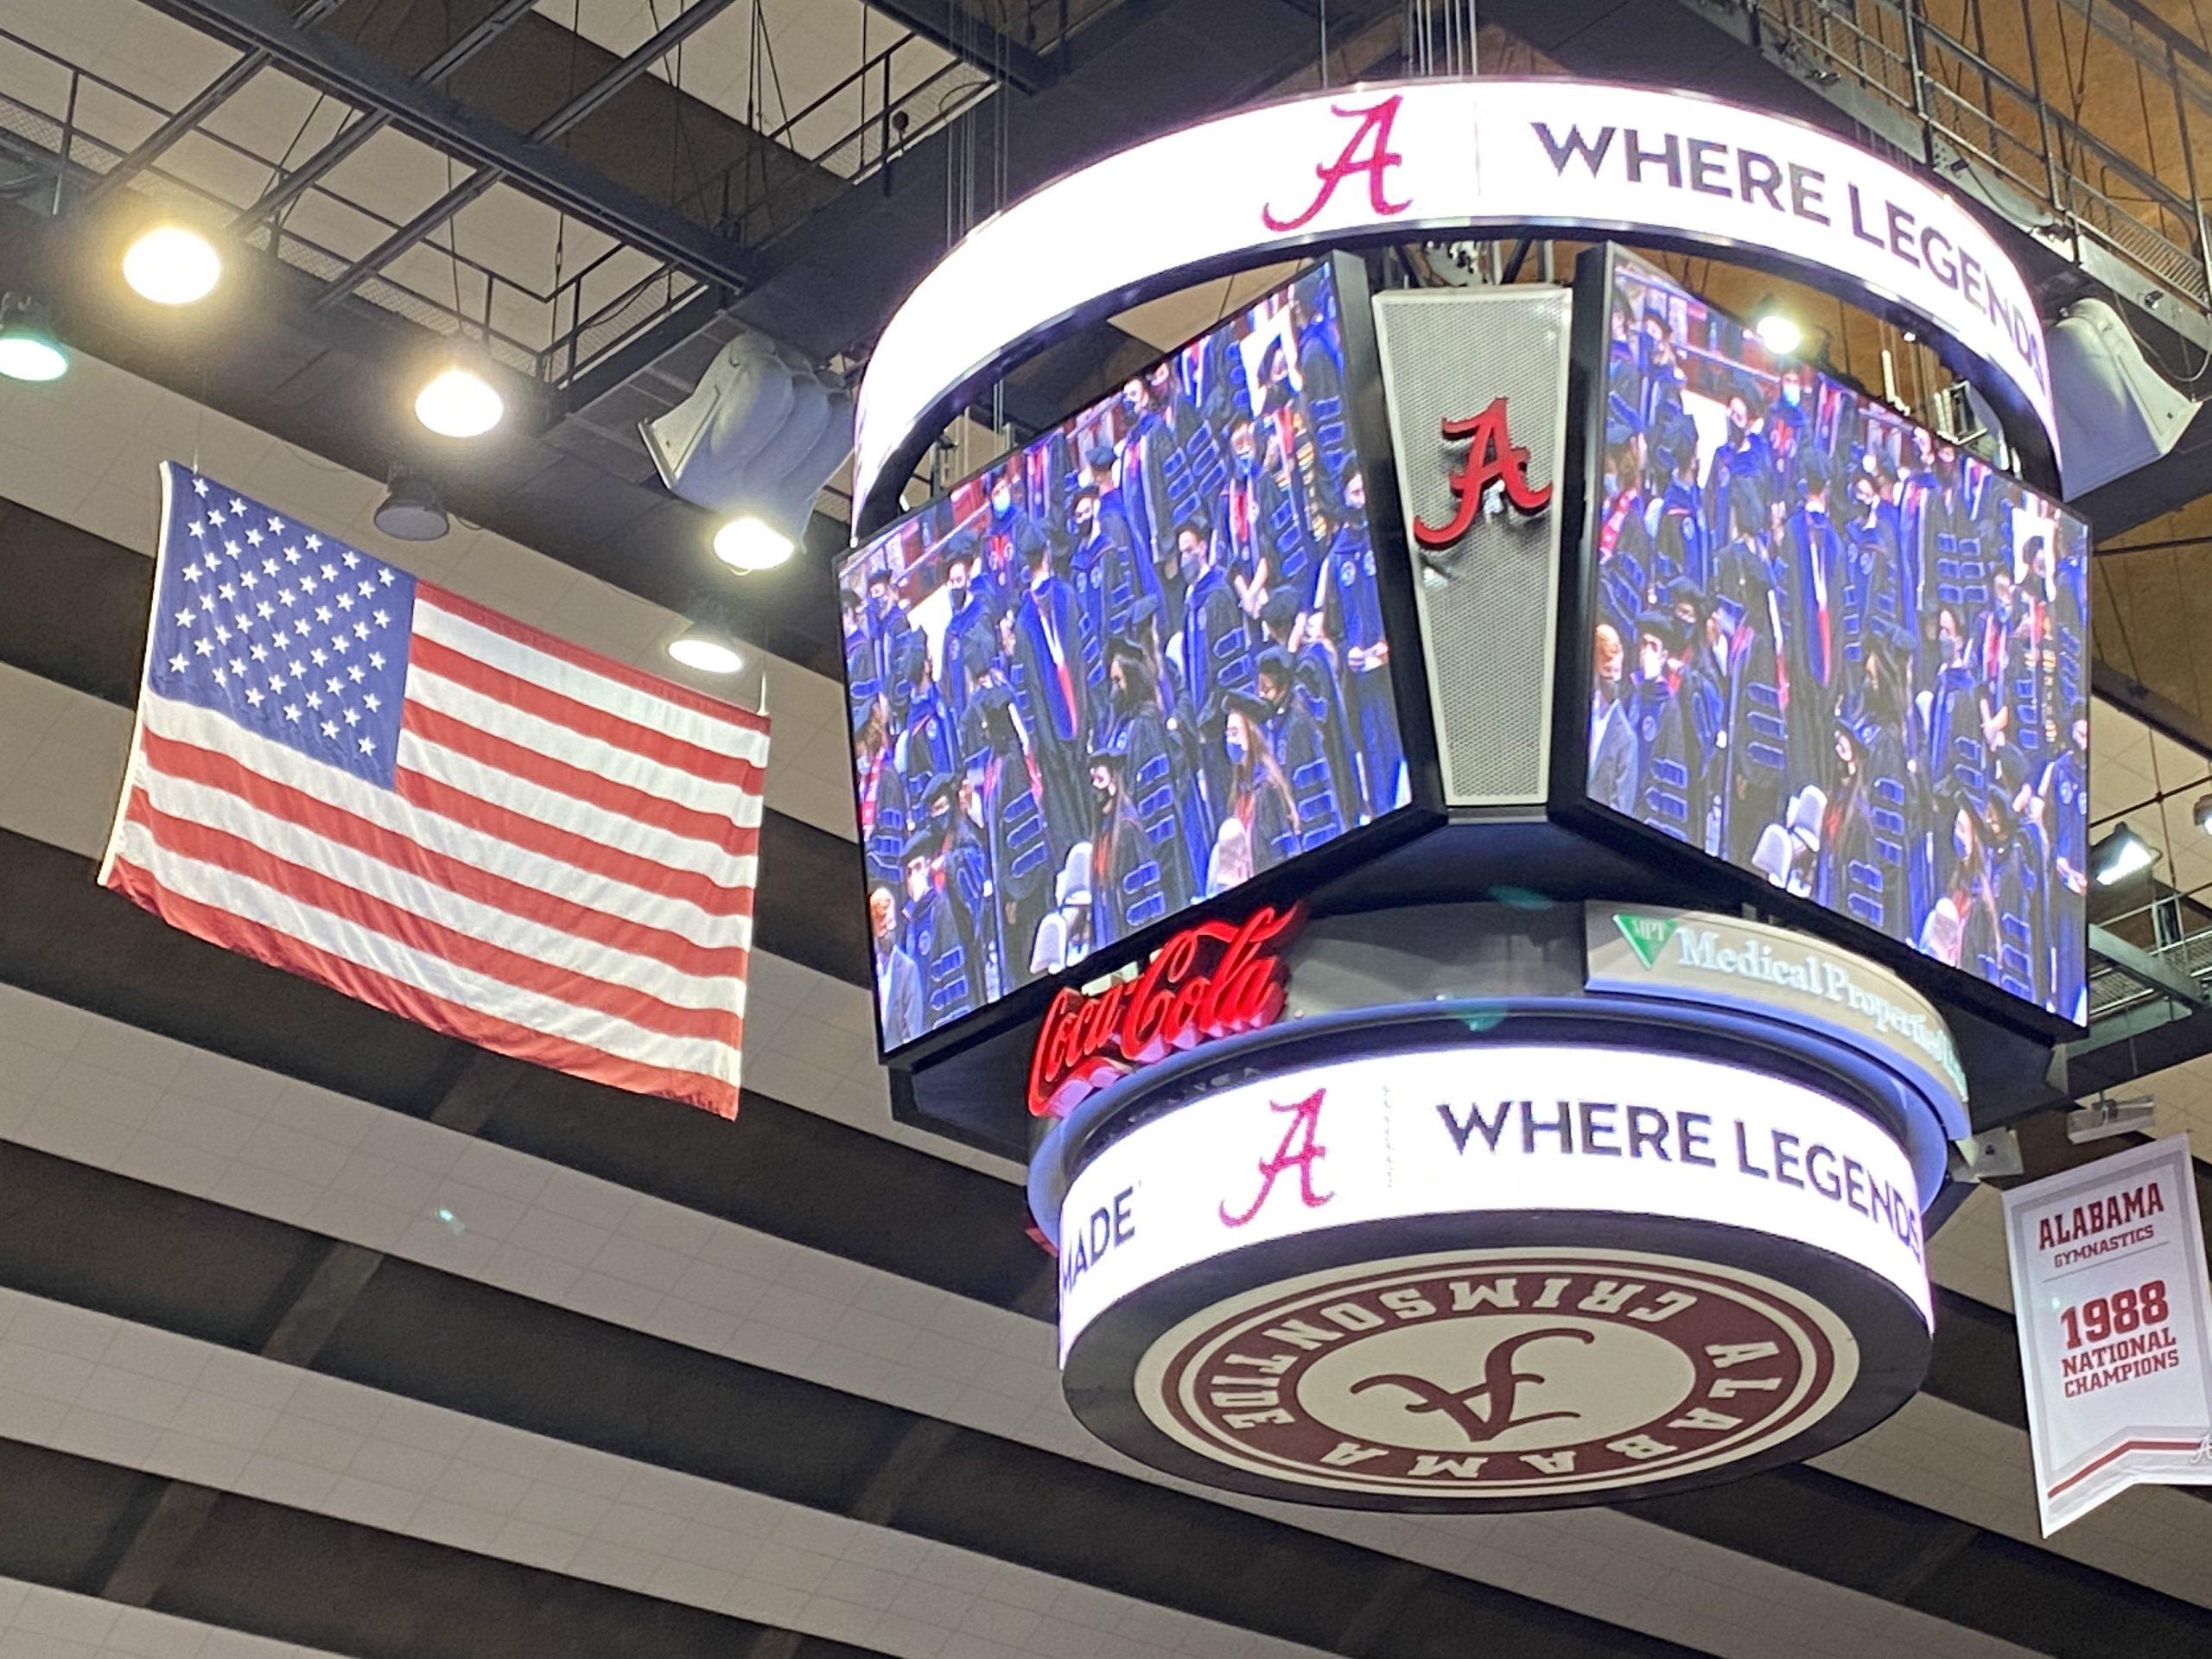 2021 & 2020 Alabama Law Graduates appear on the Jumbotron at Coleman Coliseum.